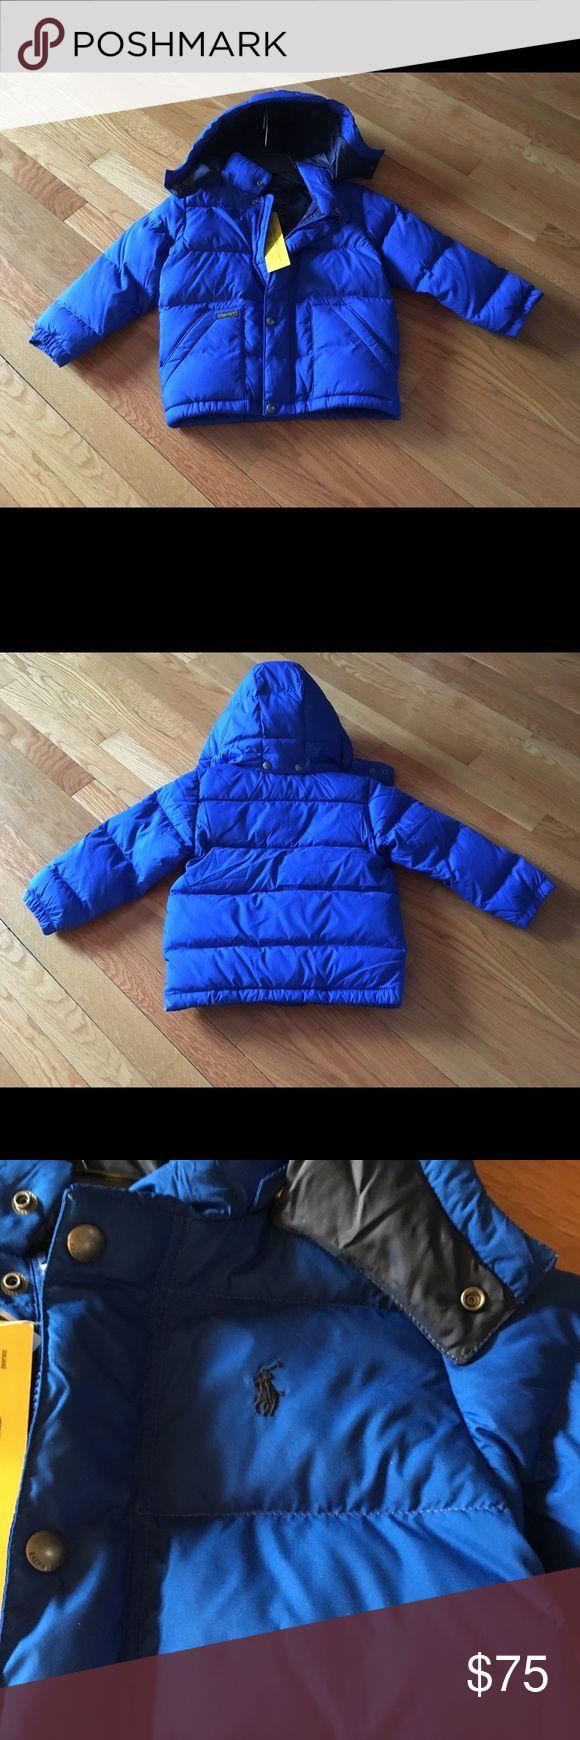 Polo Ralph Lauren Puffer Hood Jacket Coat NWT Size 4/4T